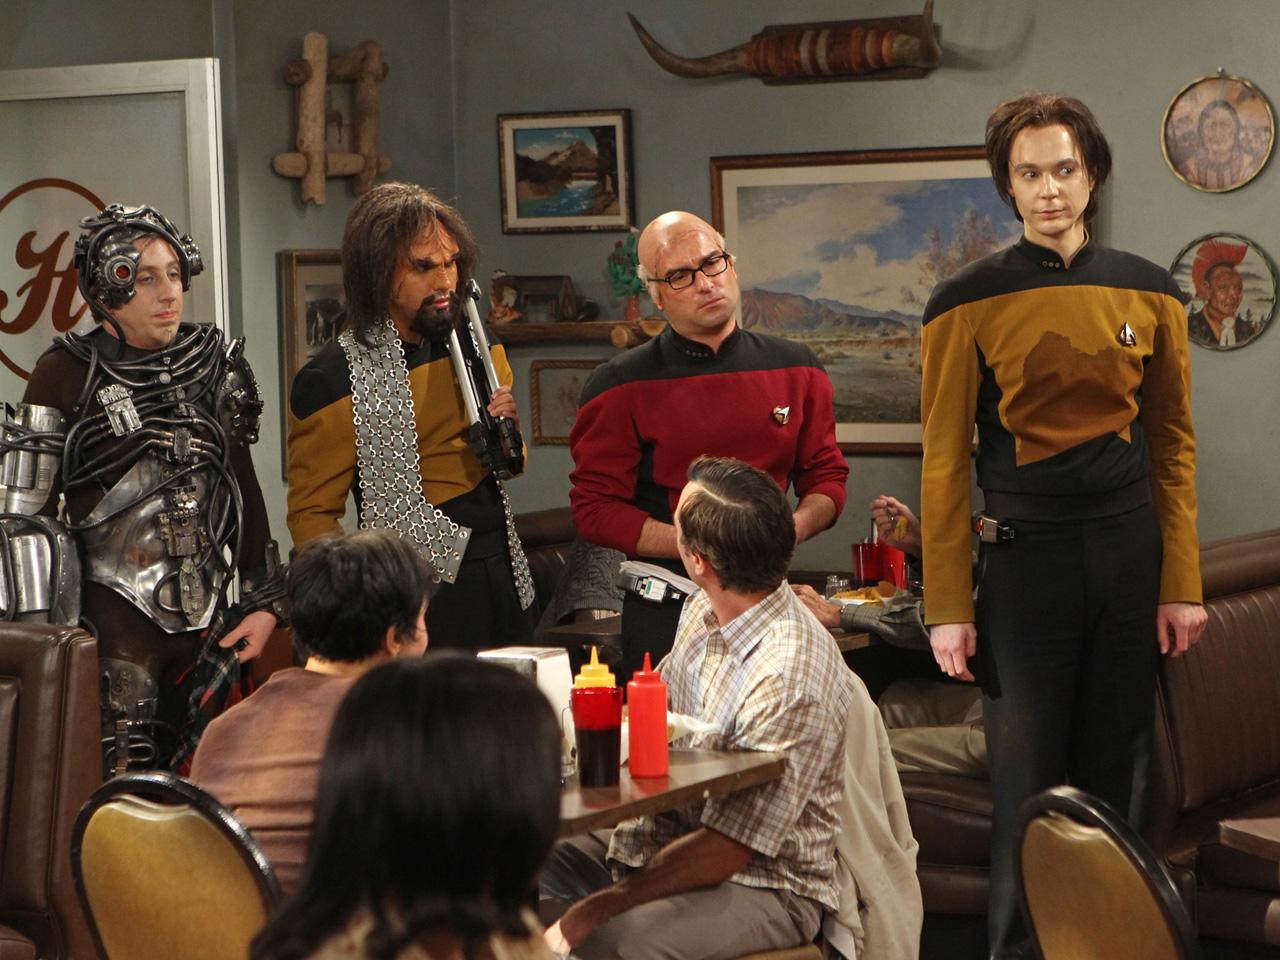 Big Bang Theory Star Trek